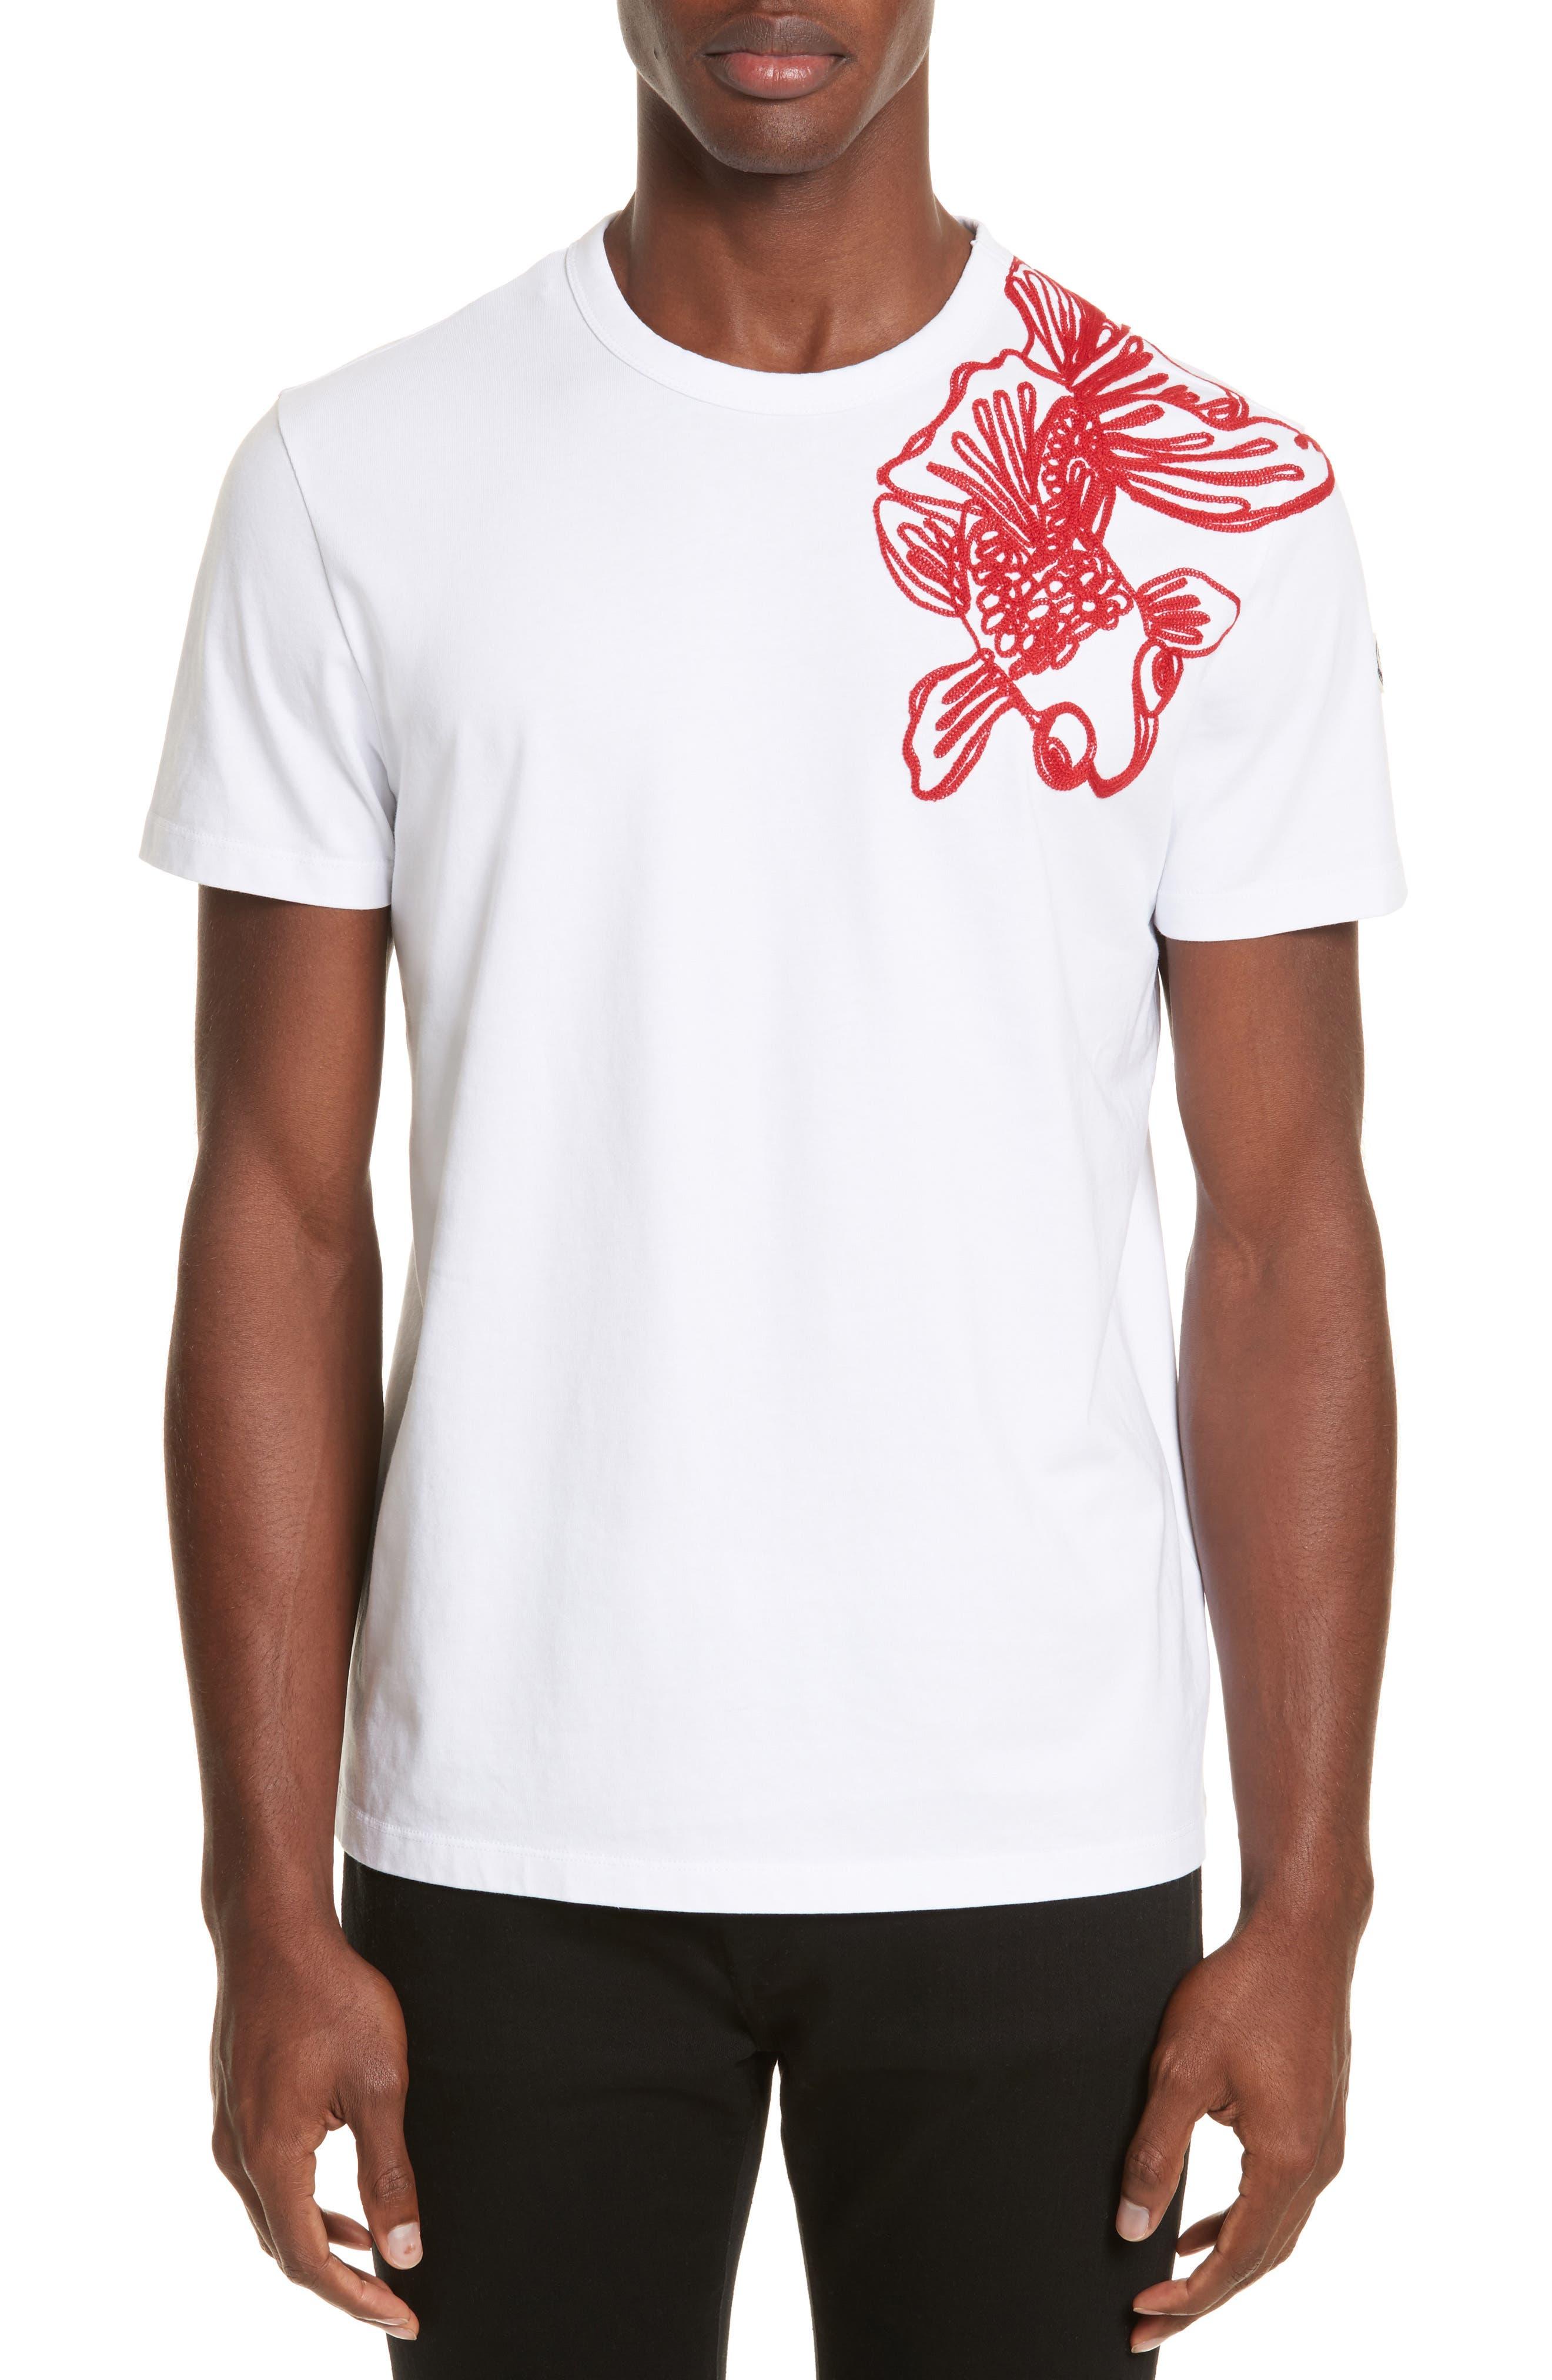 Embroidered Koi Fish T-Shirt,                             Main thumbnail 1, color,                             White